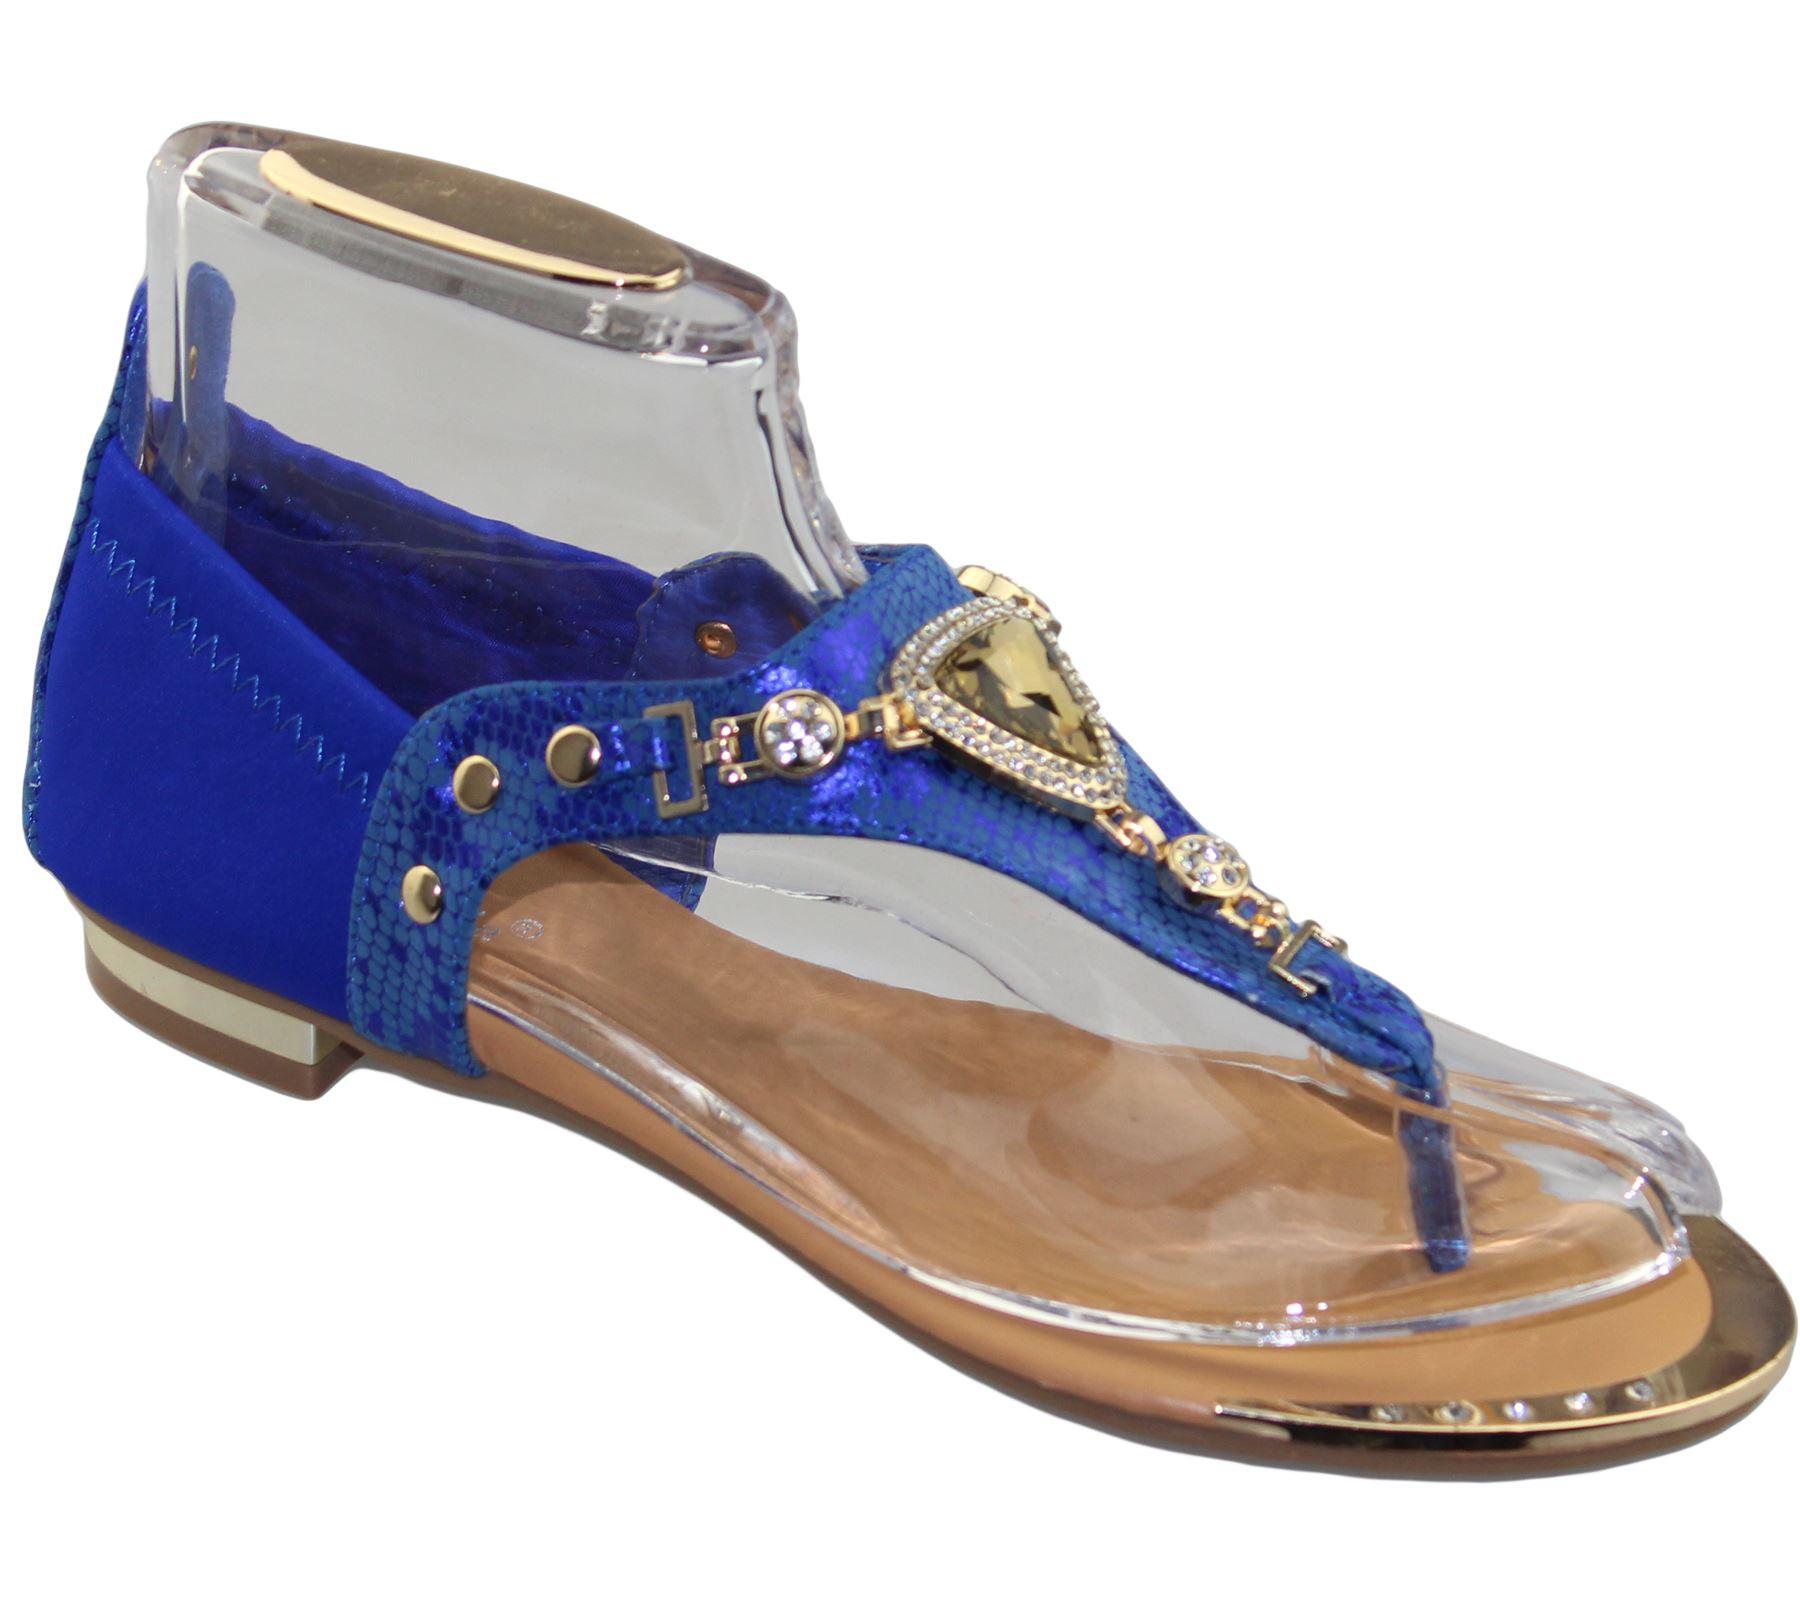 Womens-Flat-Summer-Sandals-Ladies-Diamante-Wedding-Toe-Post-Casual-Slipper thumbnail 27